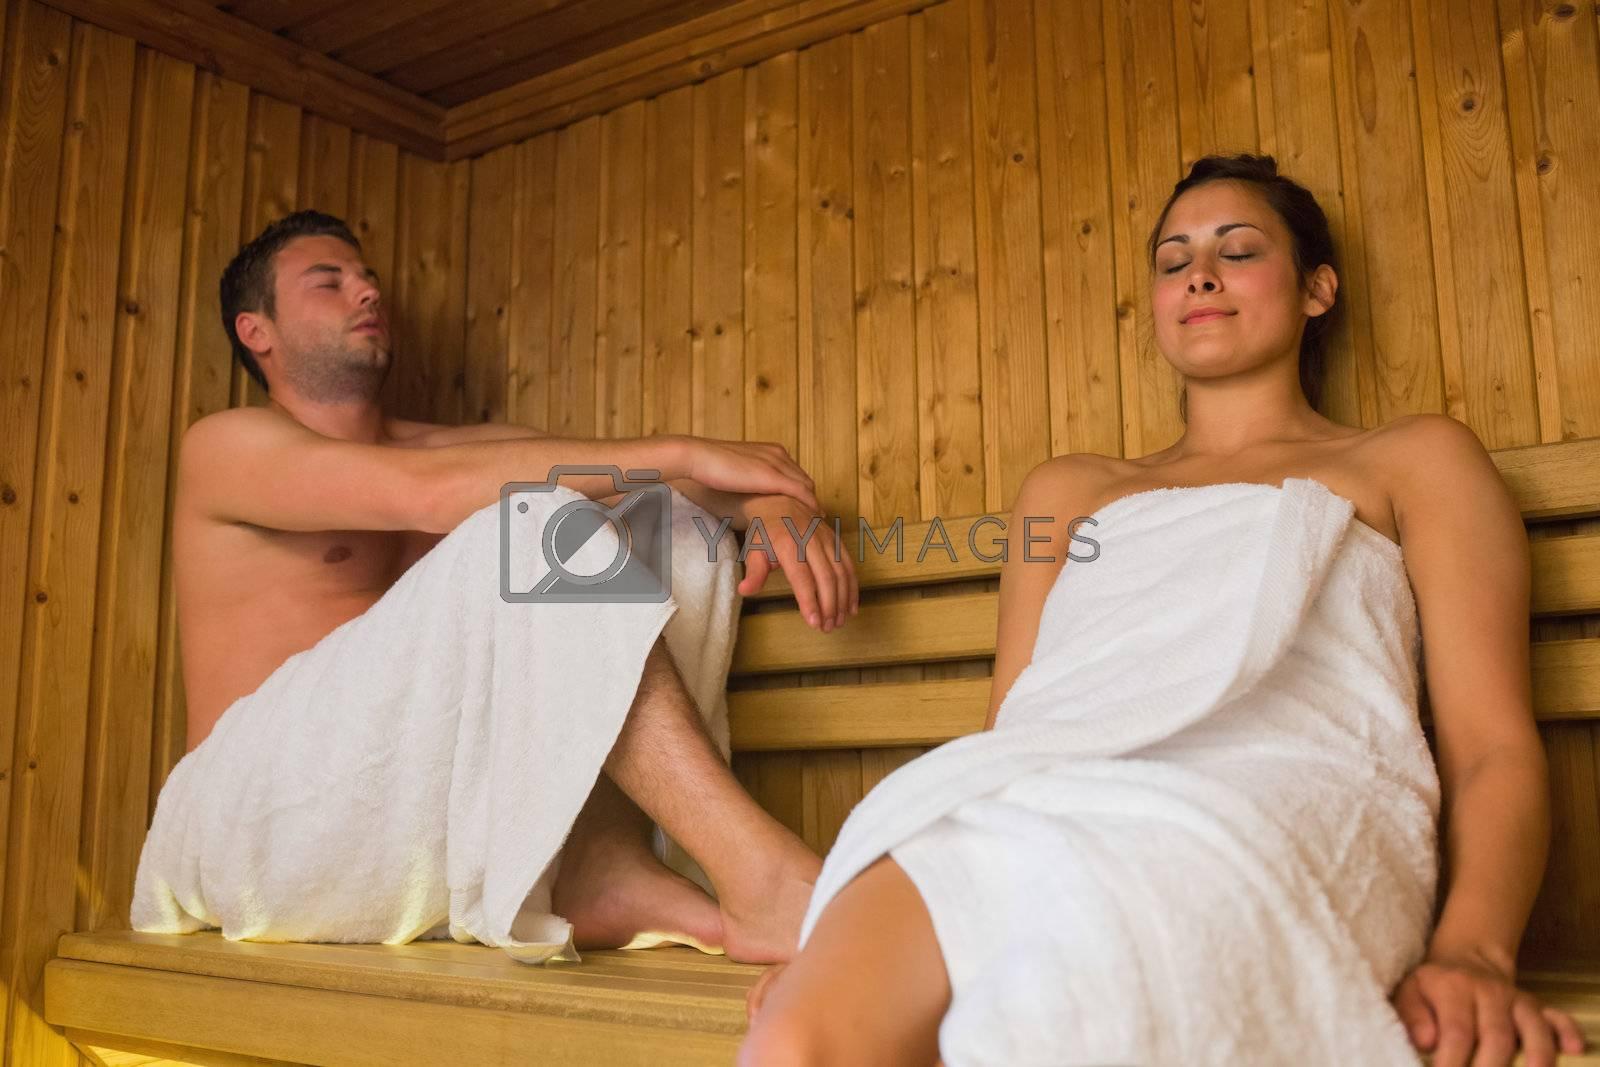 Happy couple relaxing in a sauna by Wavebreakmedia